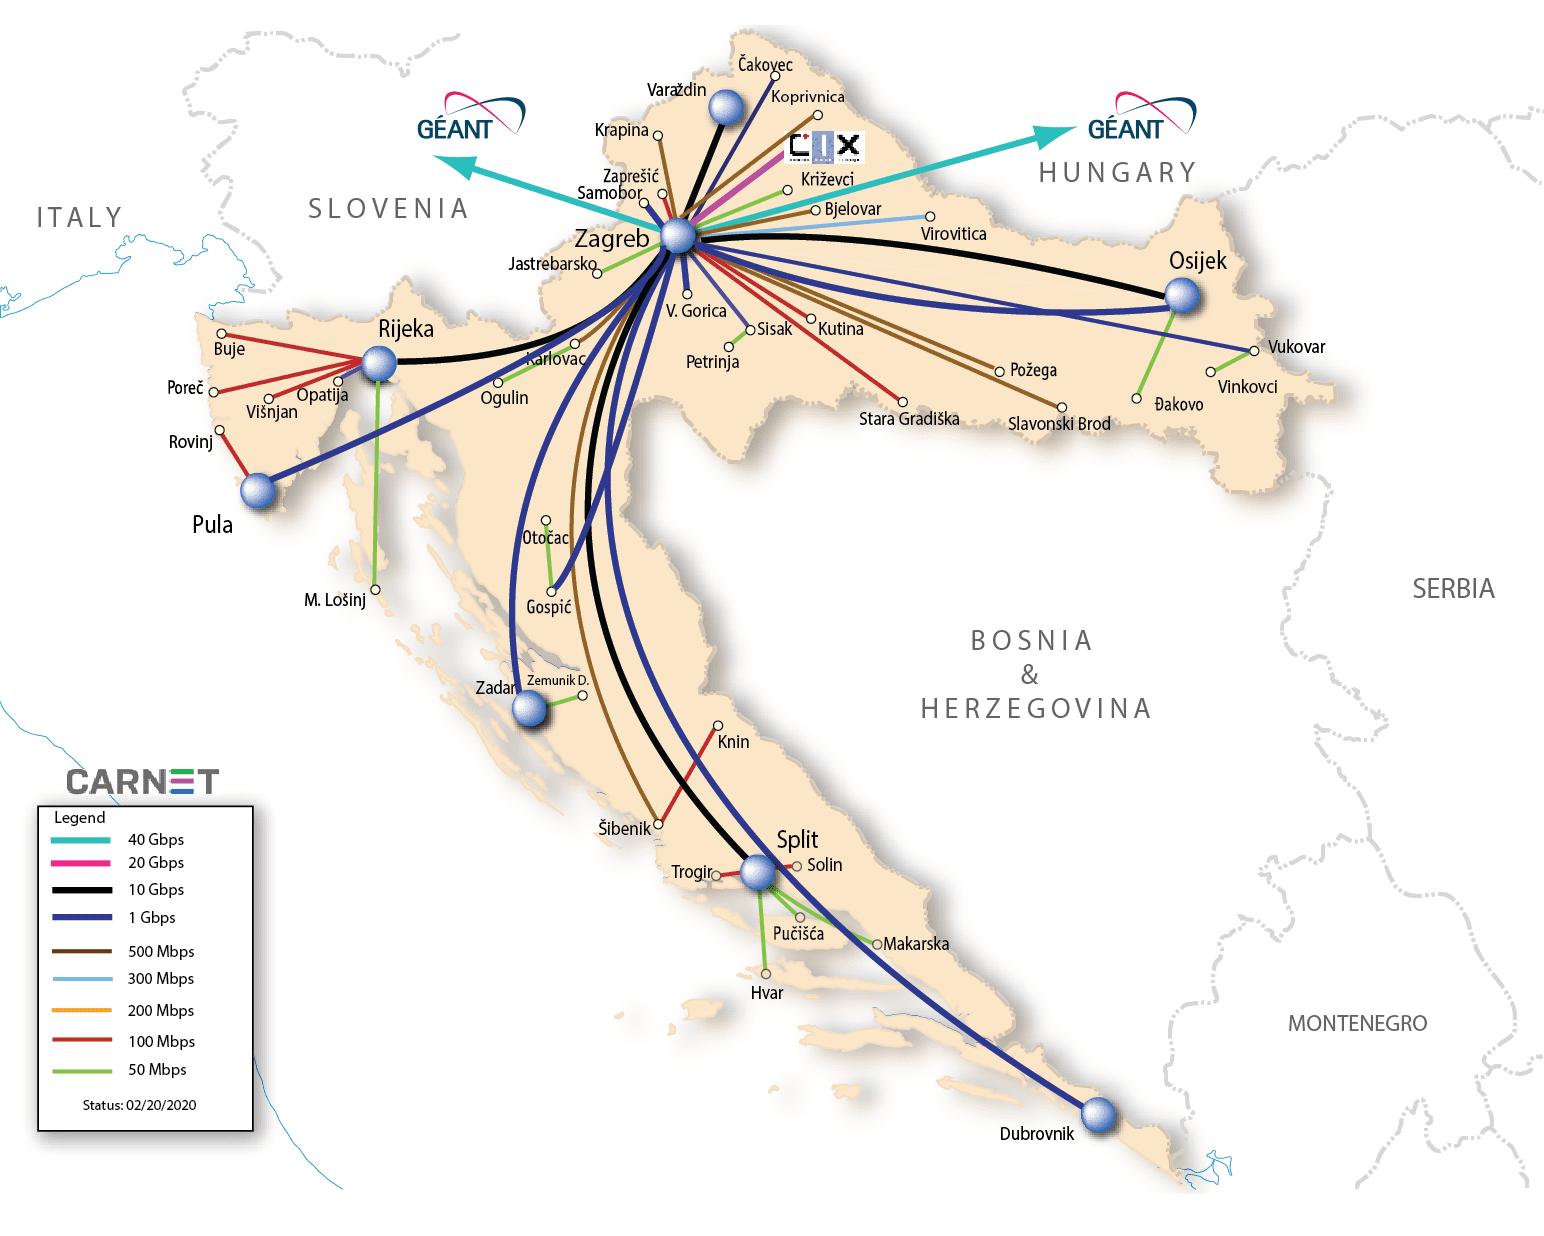 CARNET network